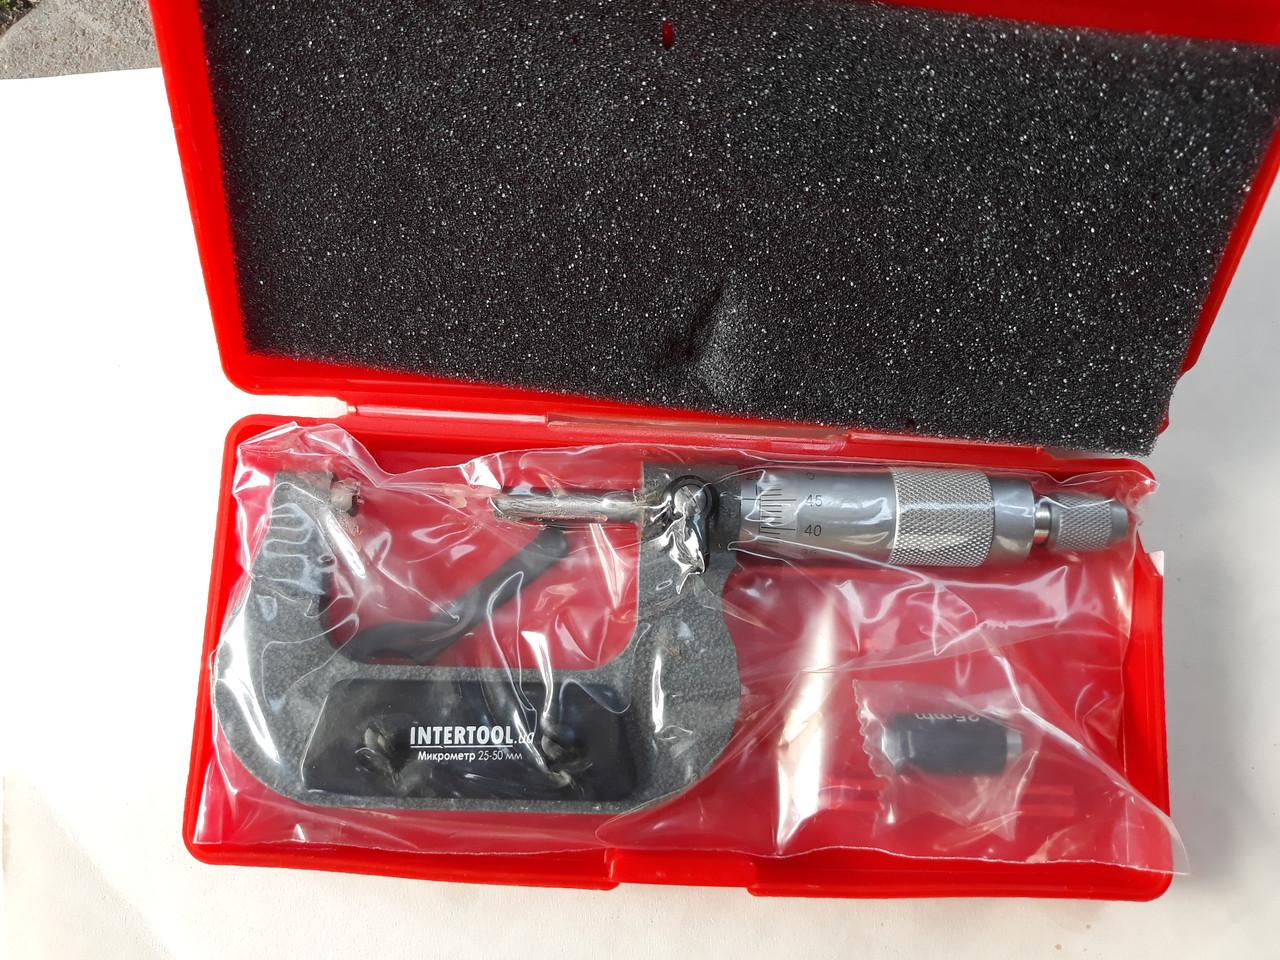 Микрометр 25-50 мм для бензопилы goodluck 4500,5200